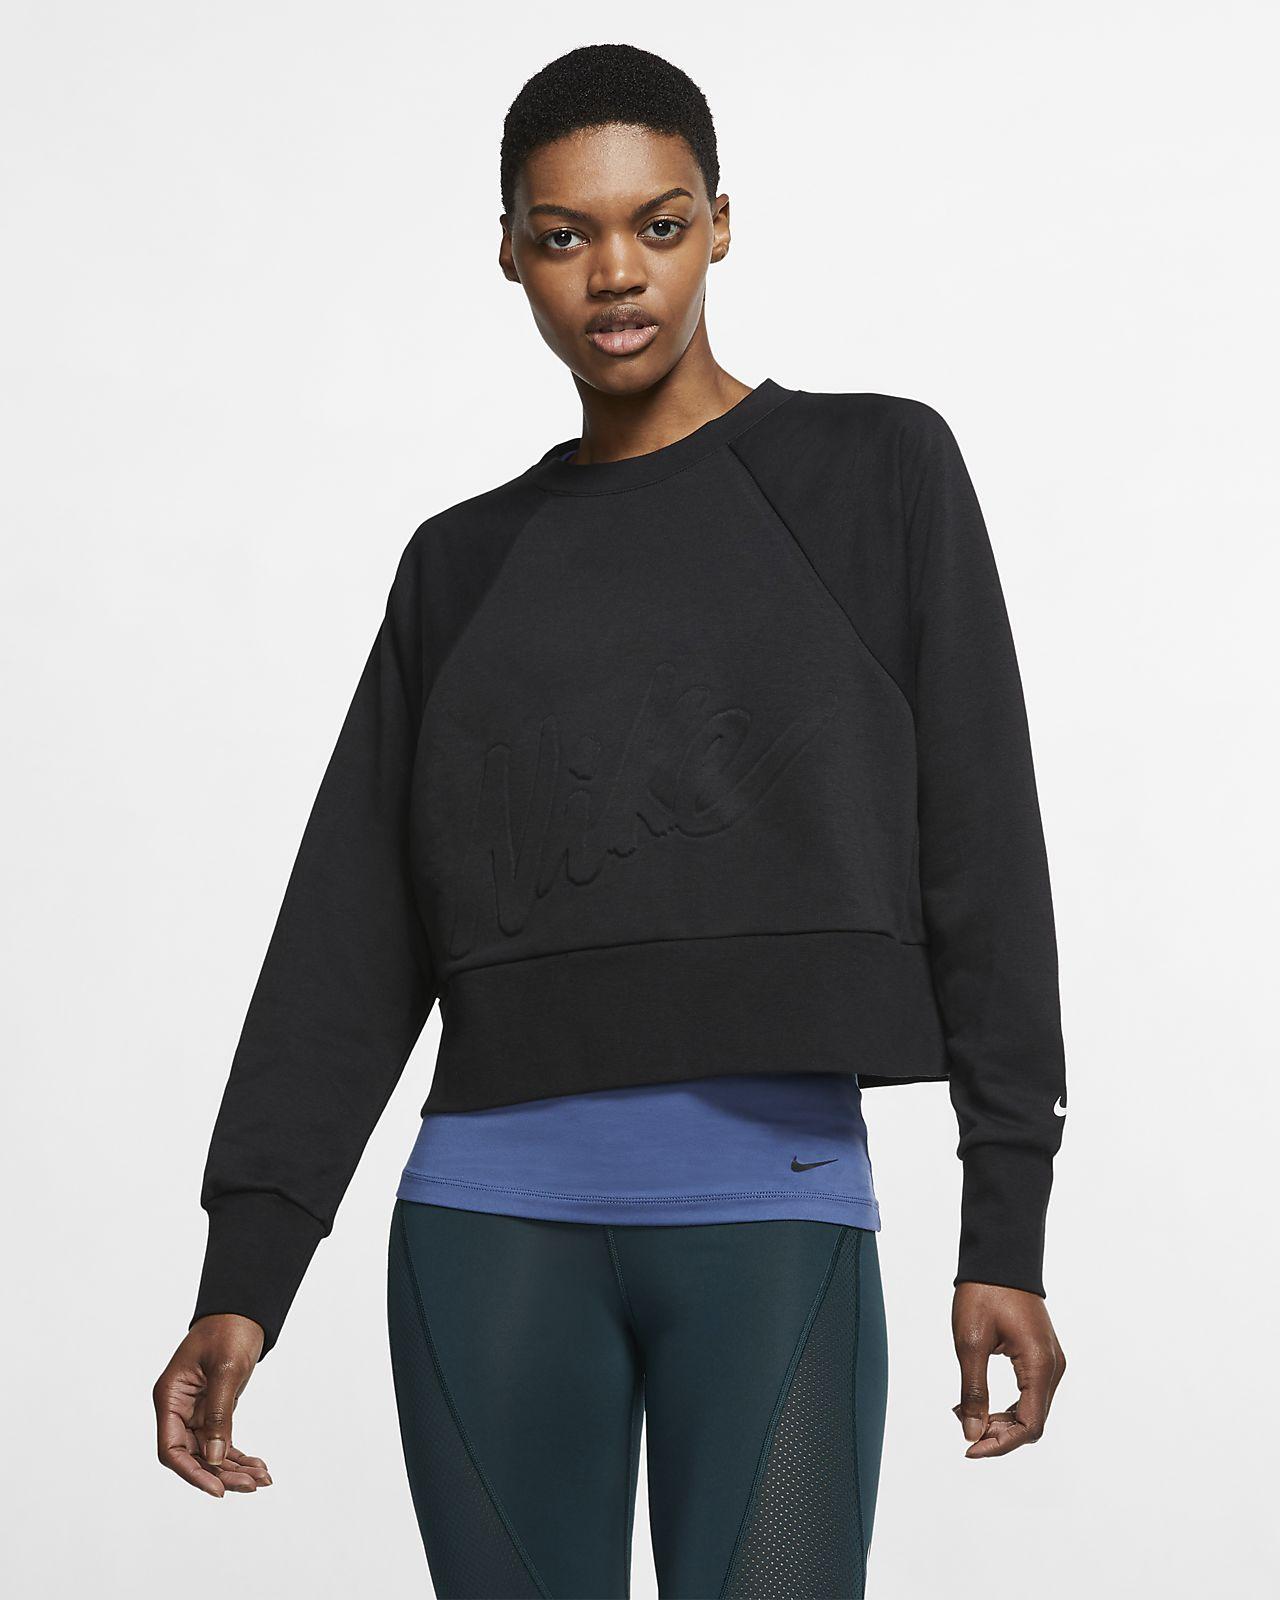 Nike Dri-FIT Get Fit treningsgenser i fleece til dame